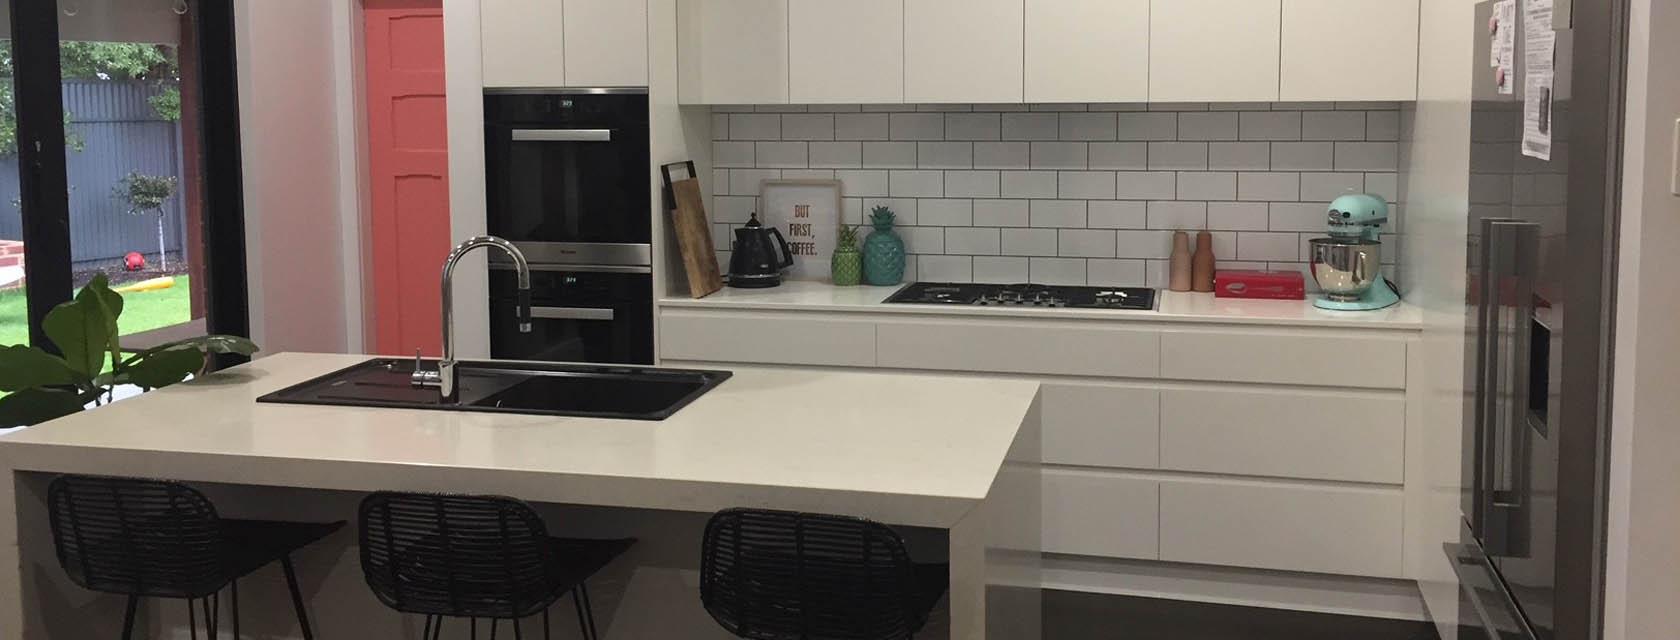 Jasse Kitchens Custom Made Kitchens In Adelaide